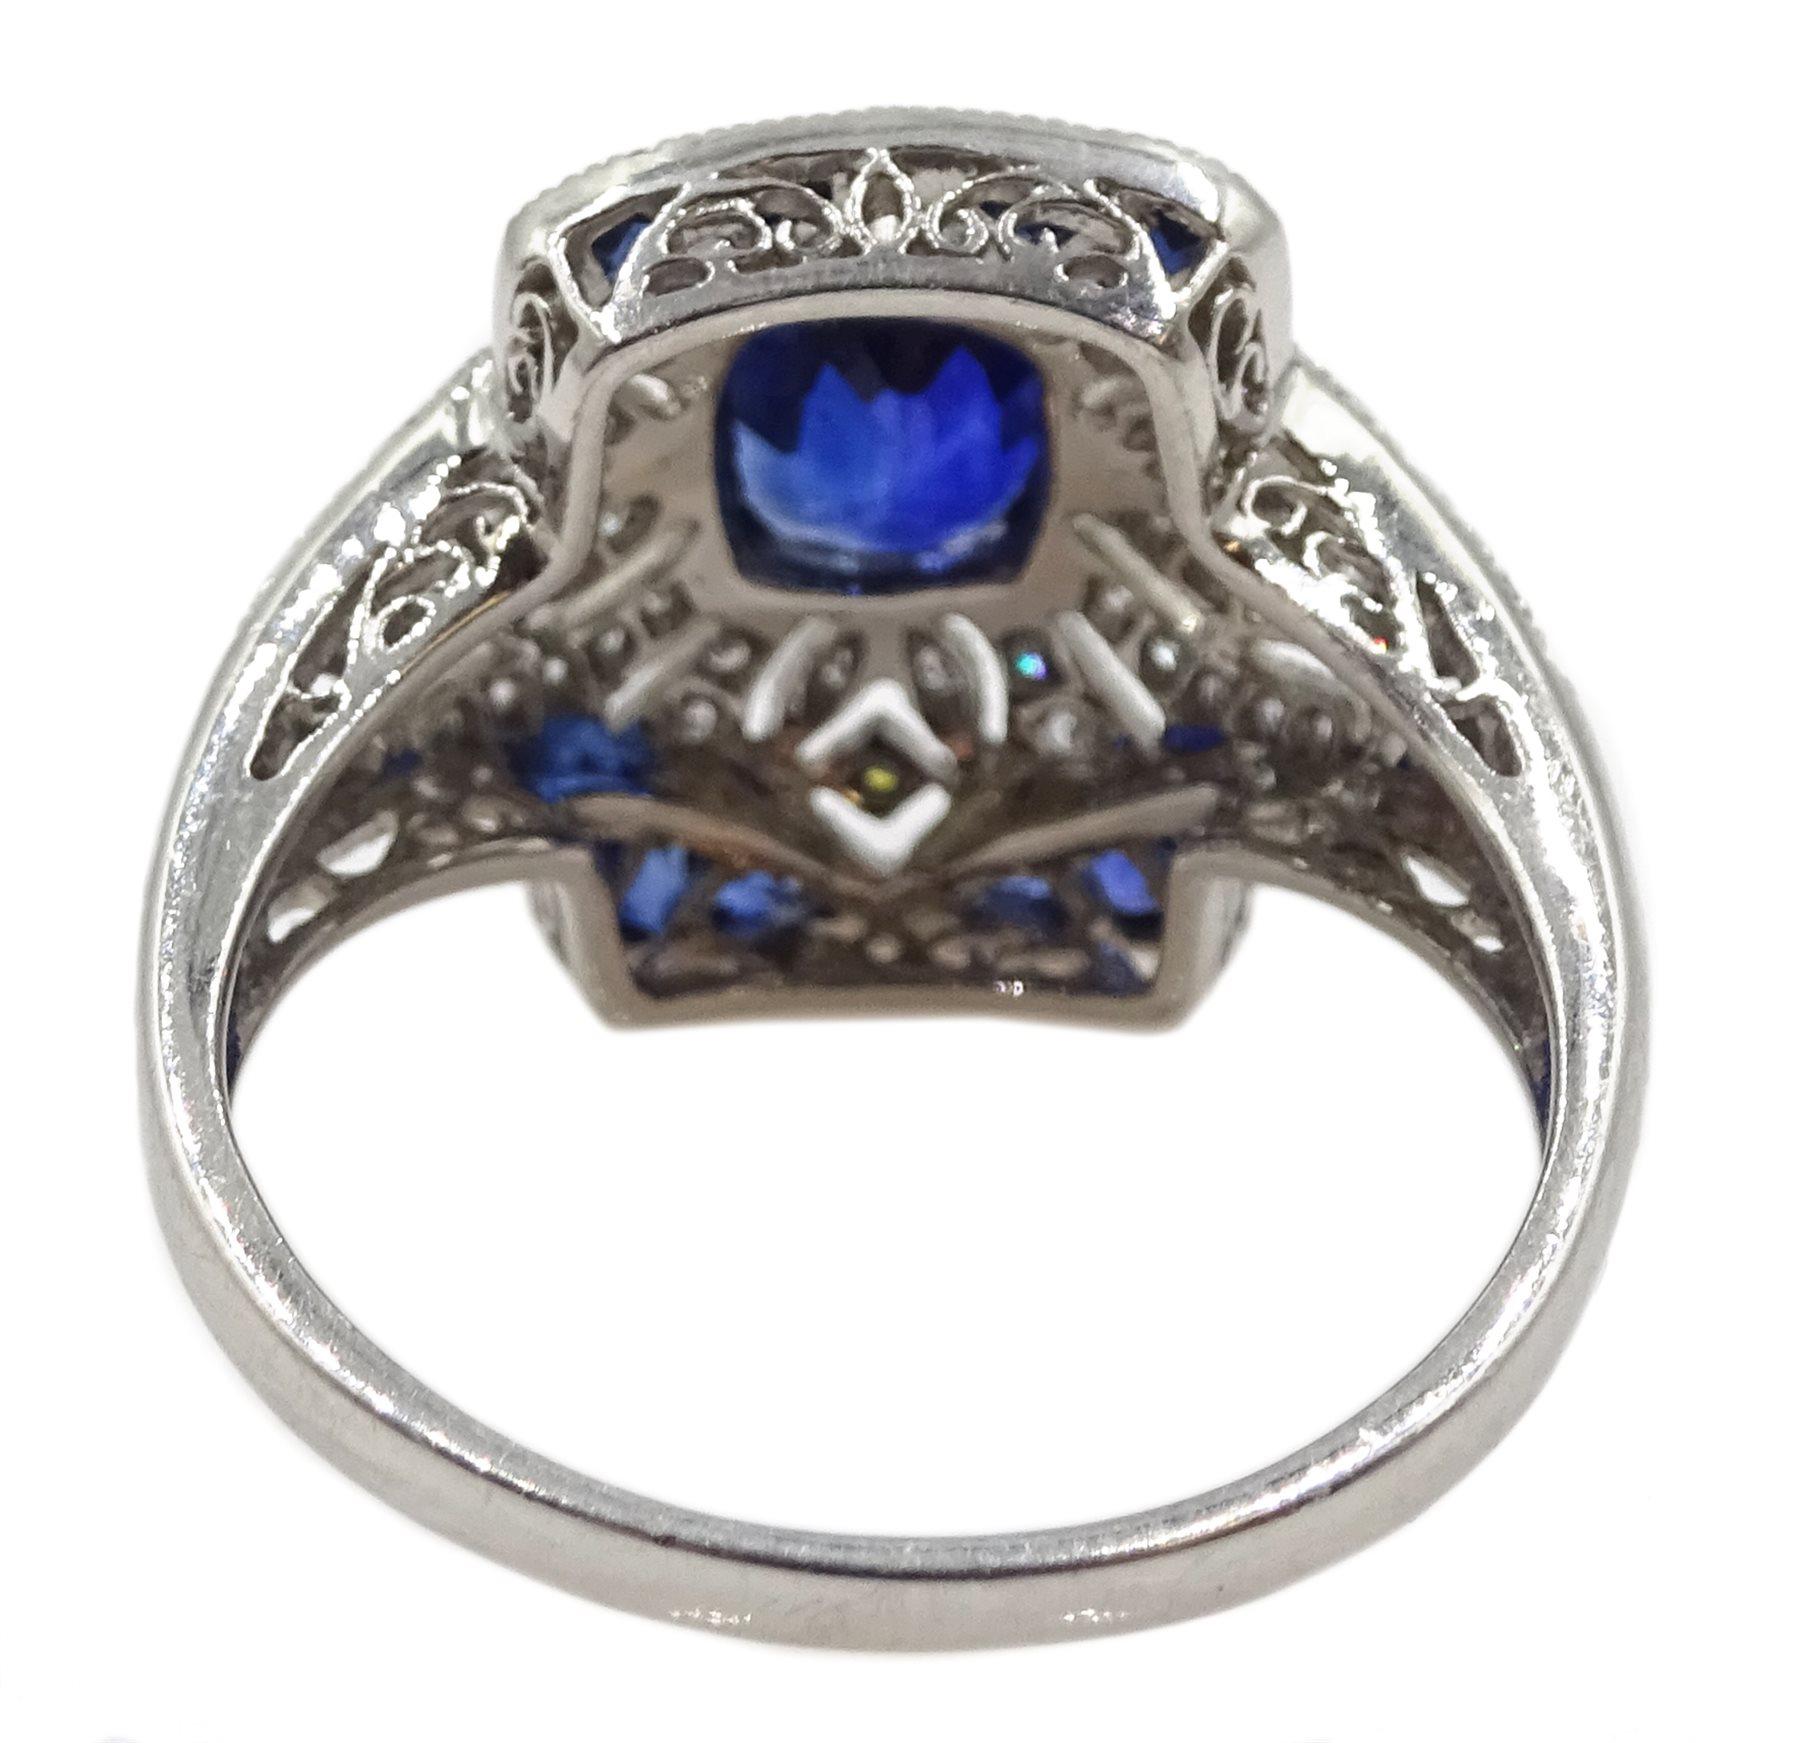 Platinum sapphire and diamond dress ring, pierced openwork setting, free UK mainland shipping - Image 5 of 6